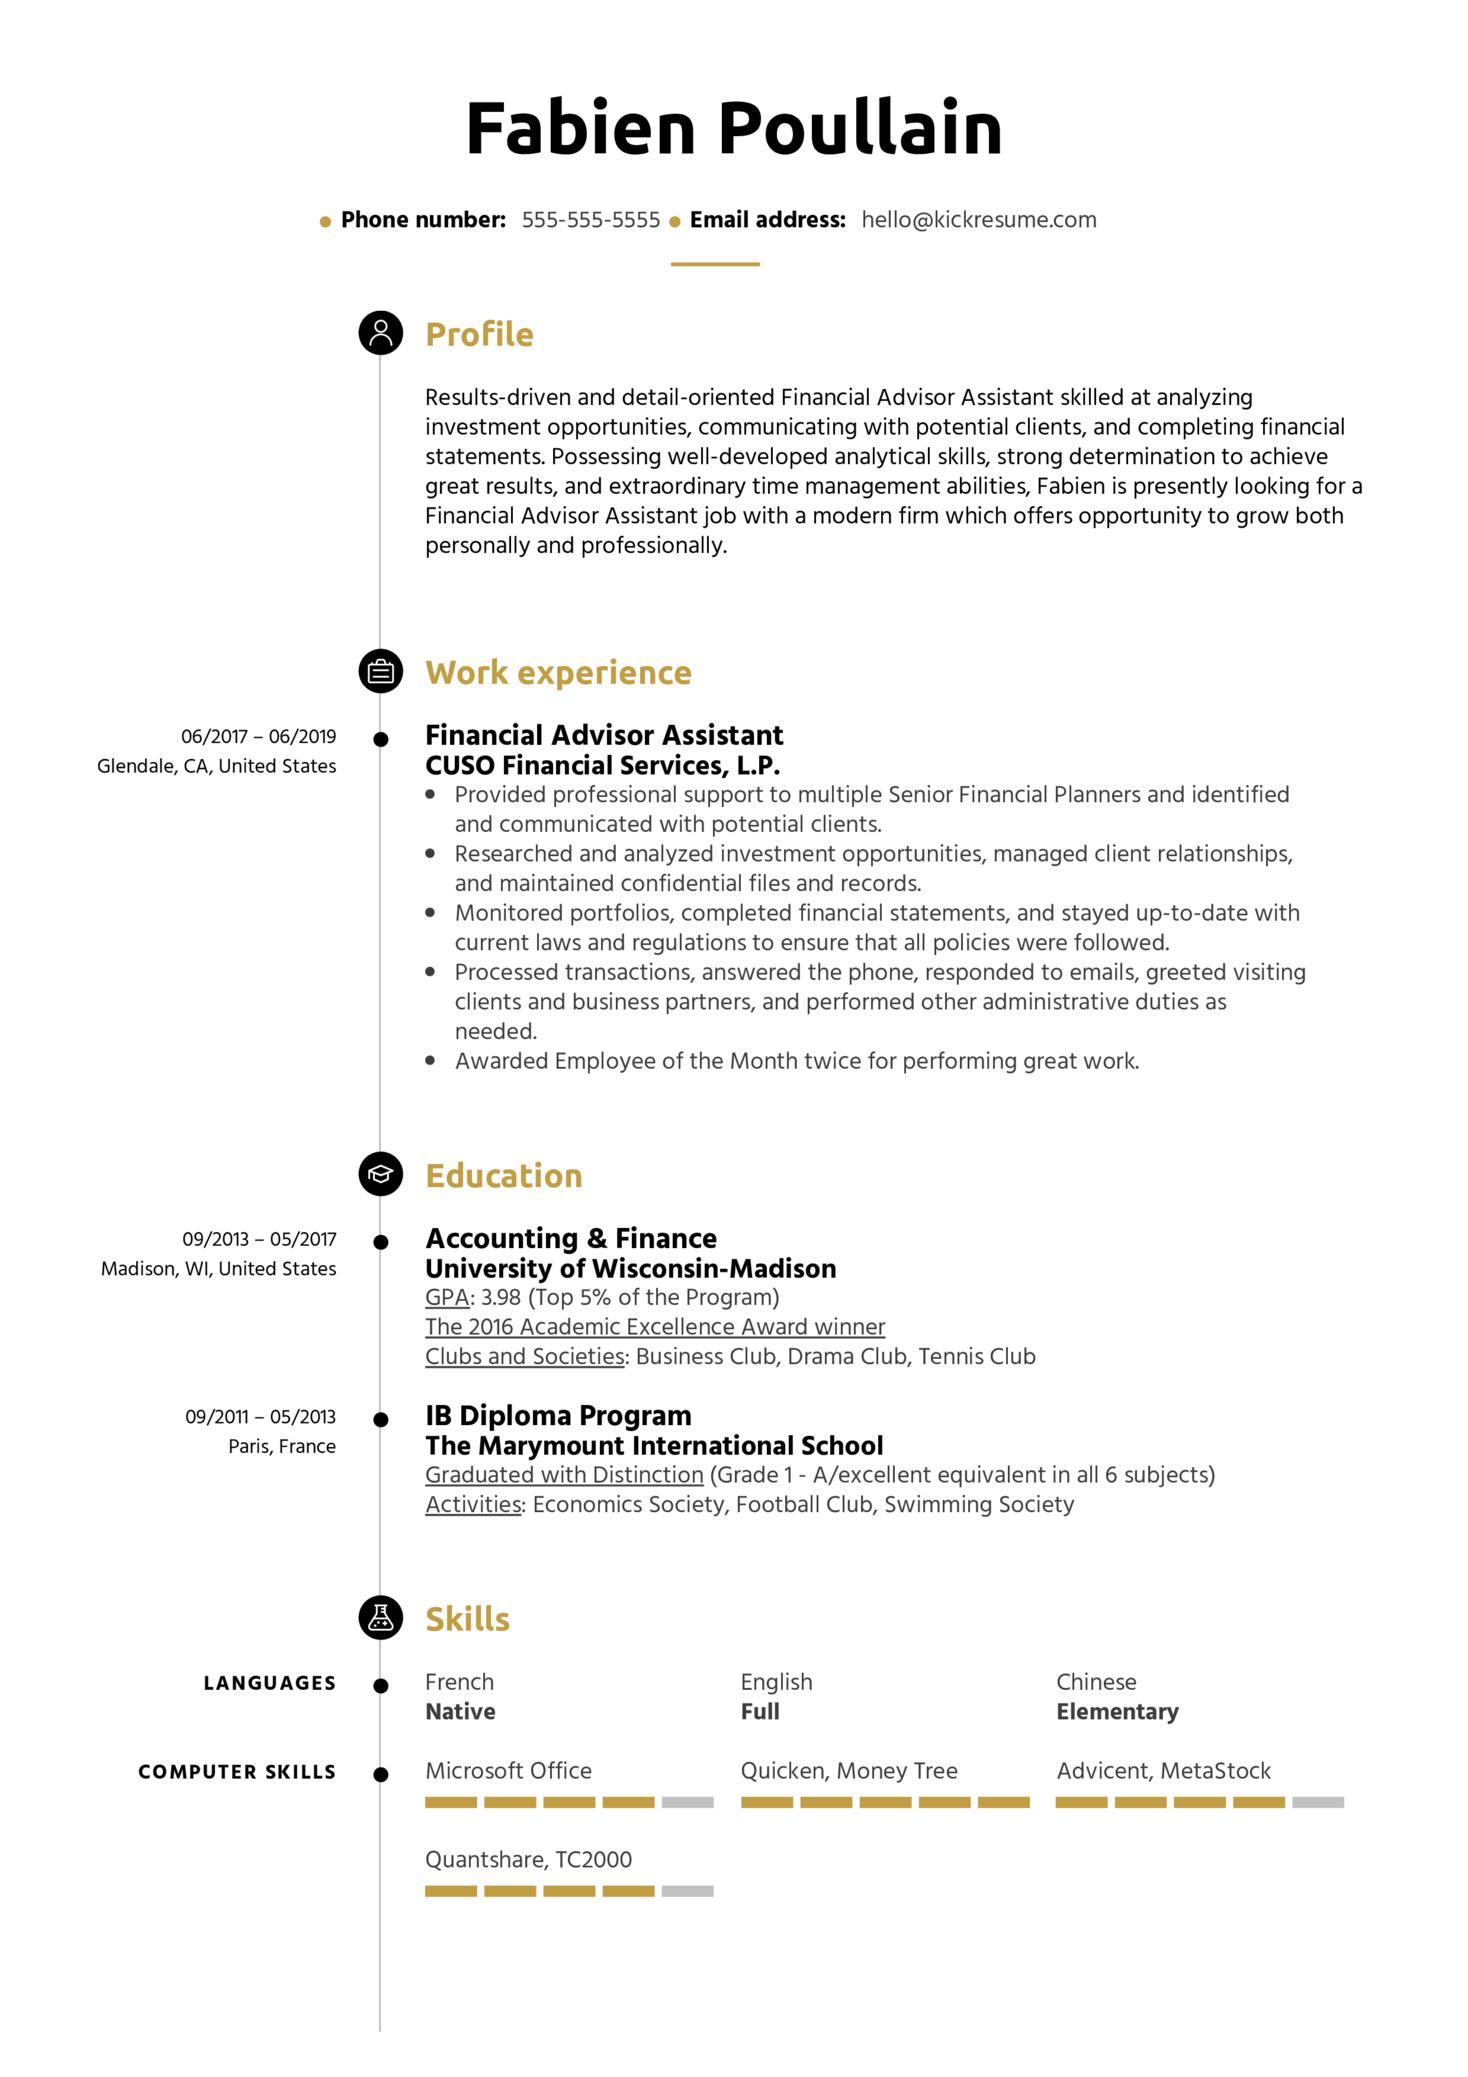 Financial Advisor Assistant Resume Sample (Teil 1)